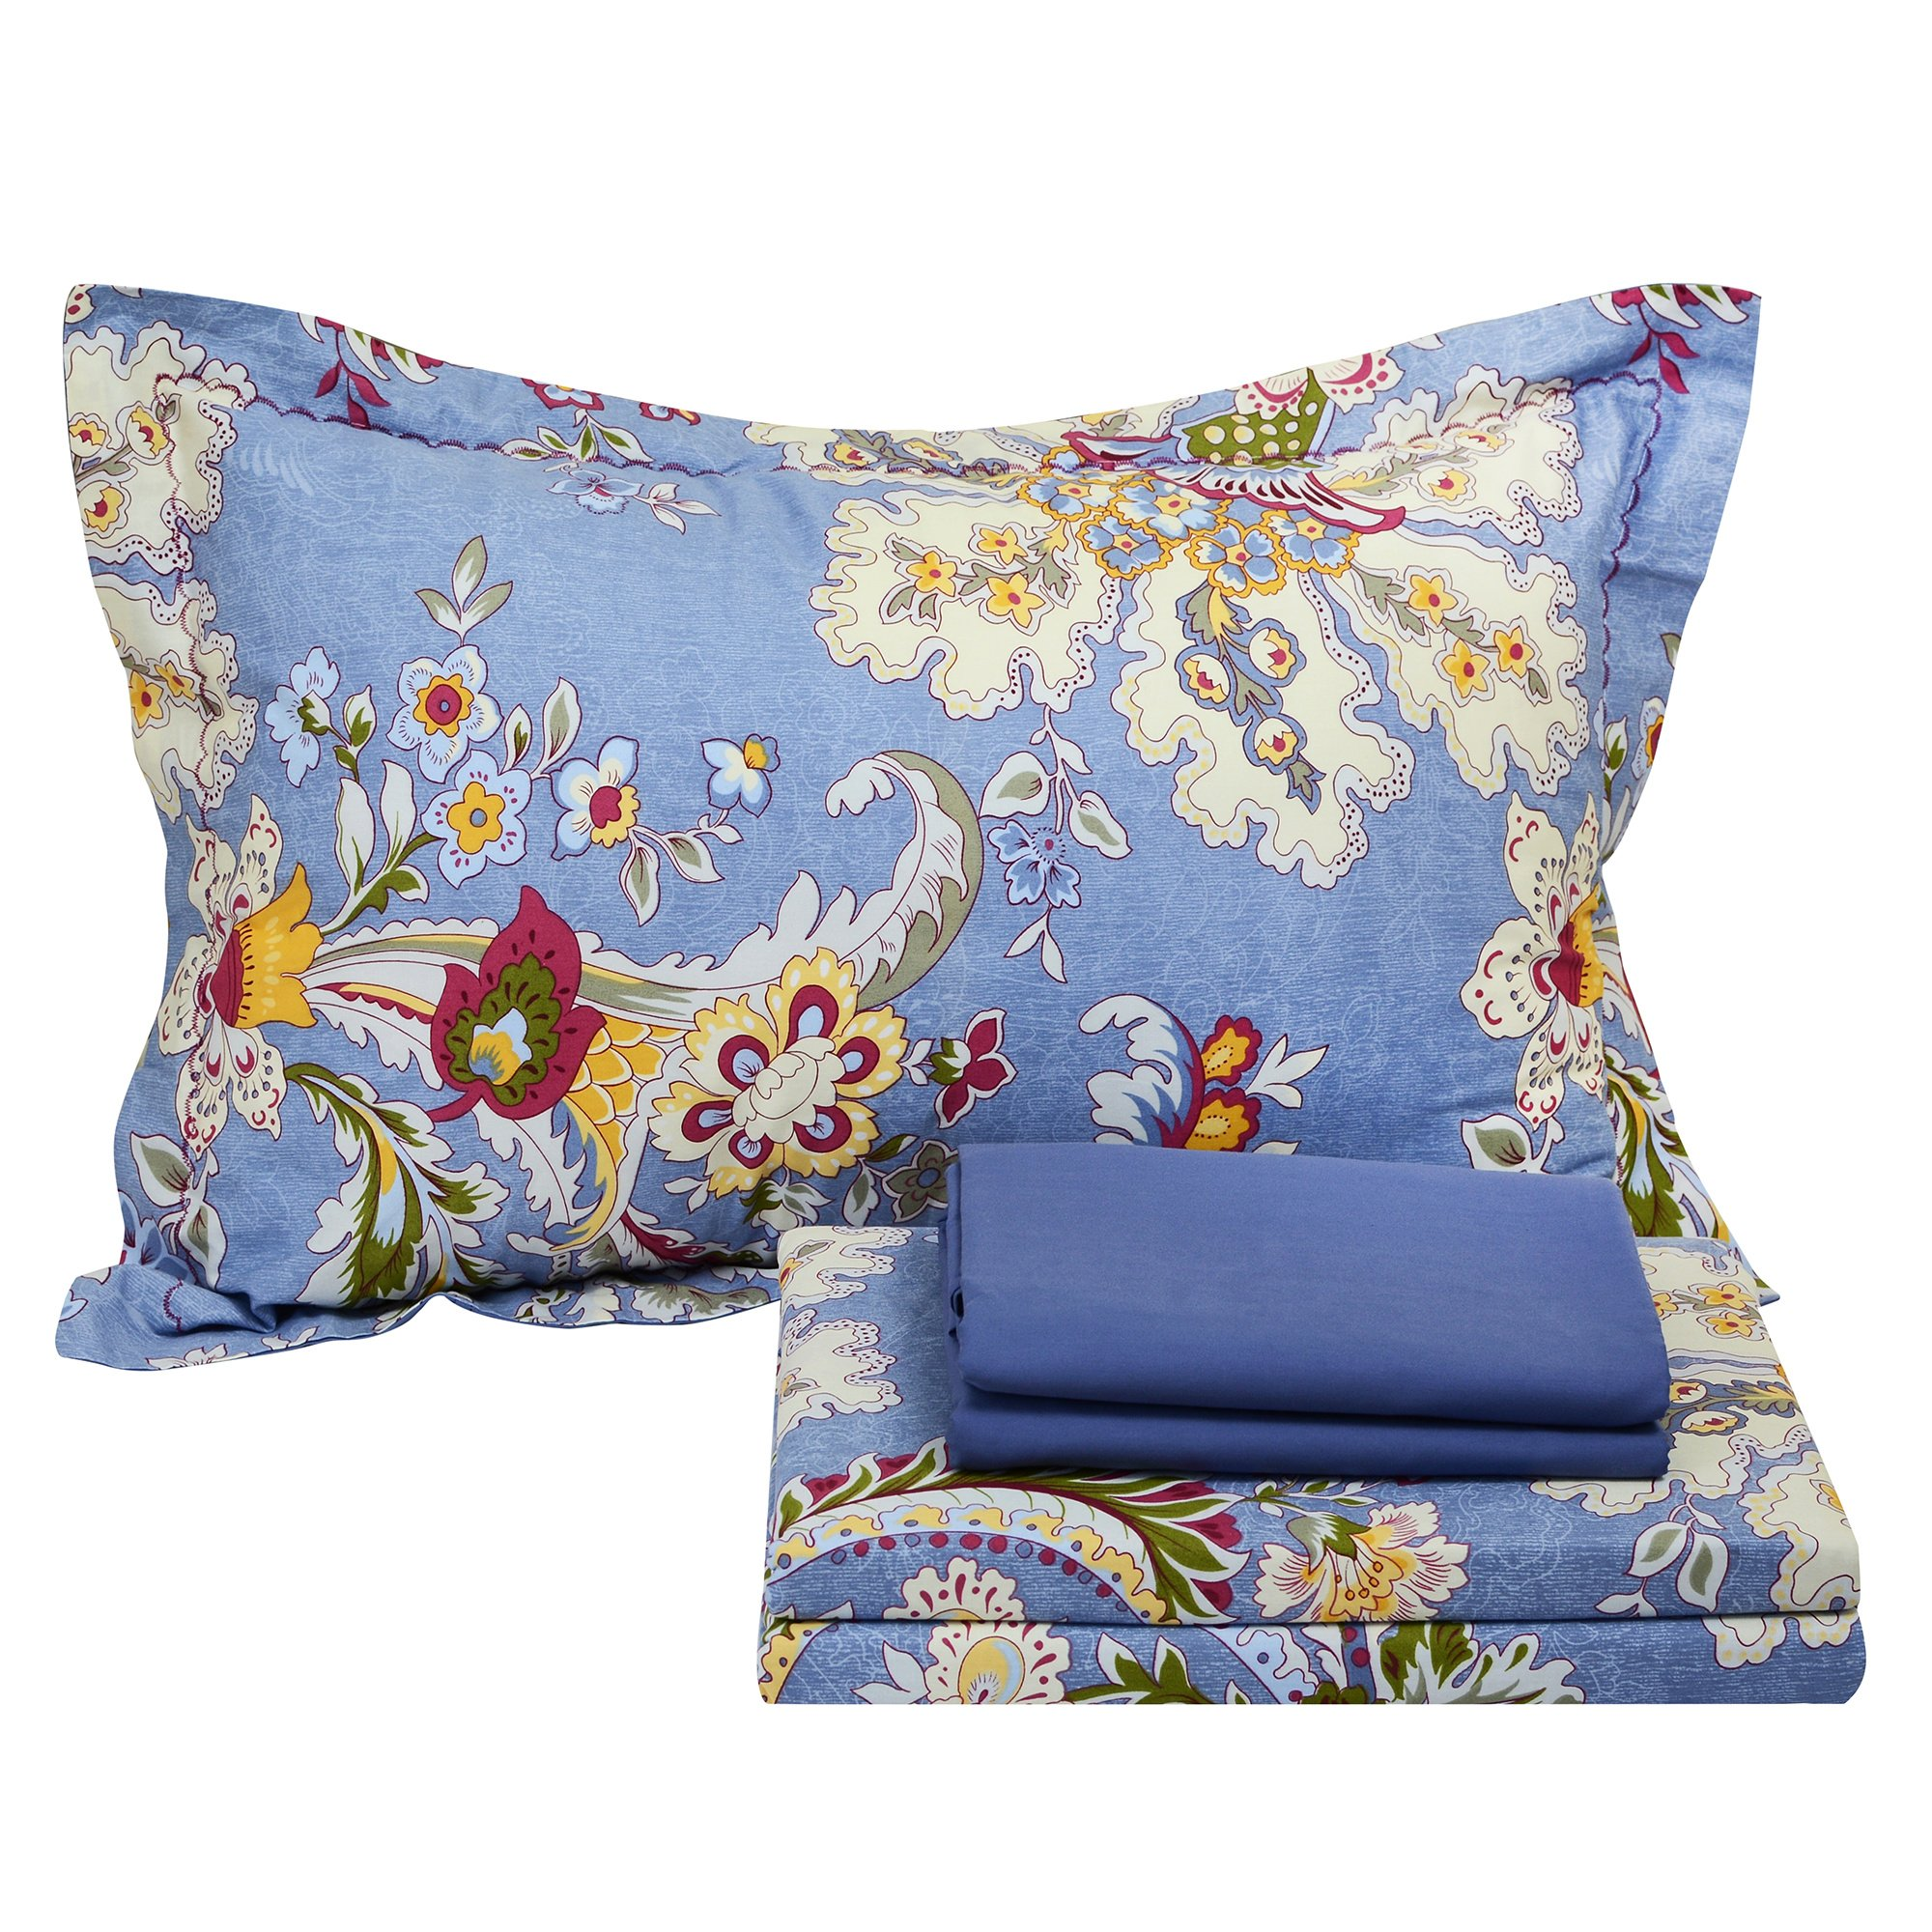 FADFAY Light Purple Bedding Set Paisley Cotton Bedroom Set 4-Piece Queen Size